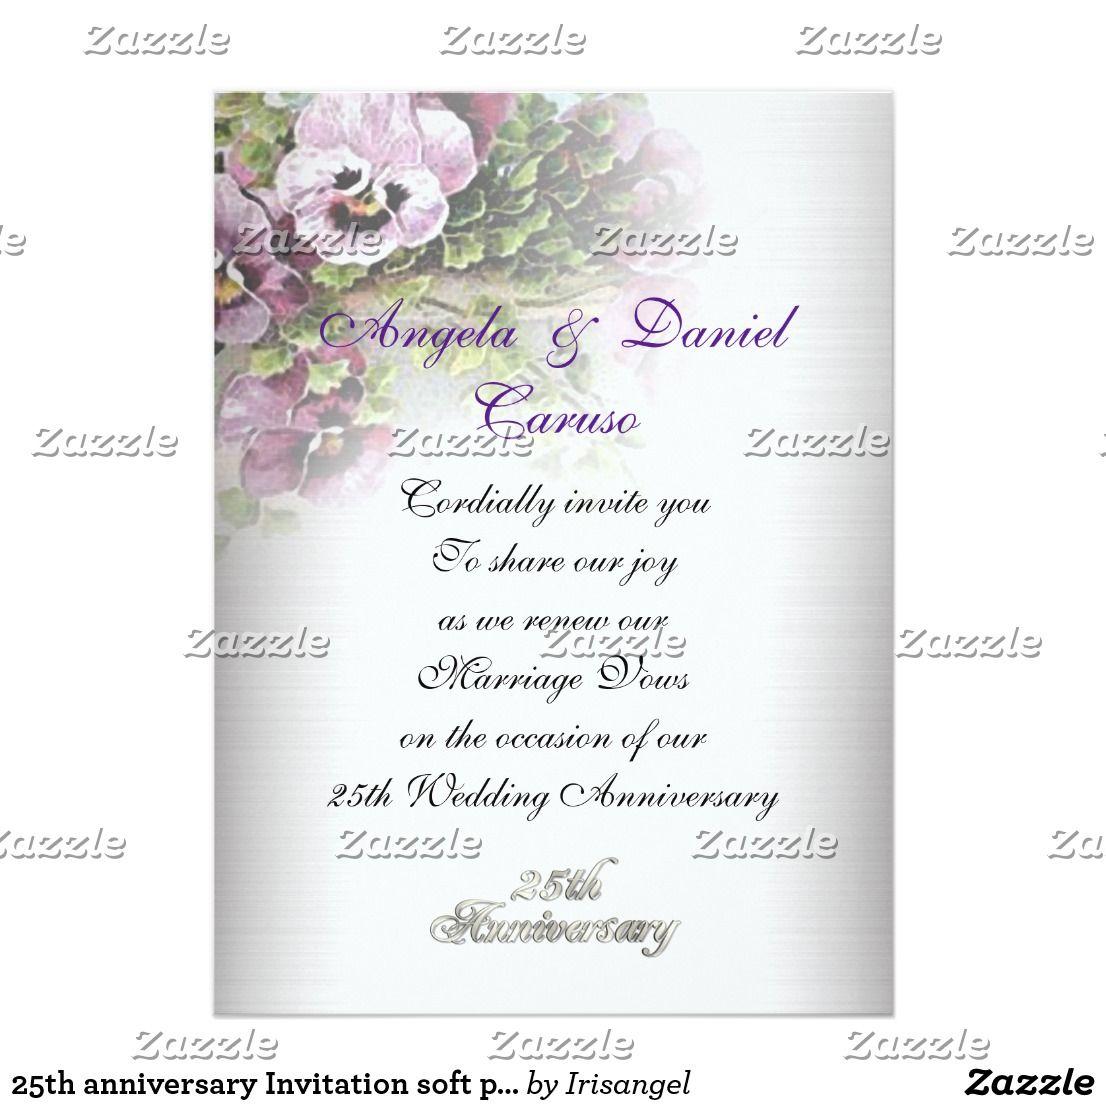 25th anniversary Invitation soft pansies | Anniversary invitations